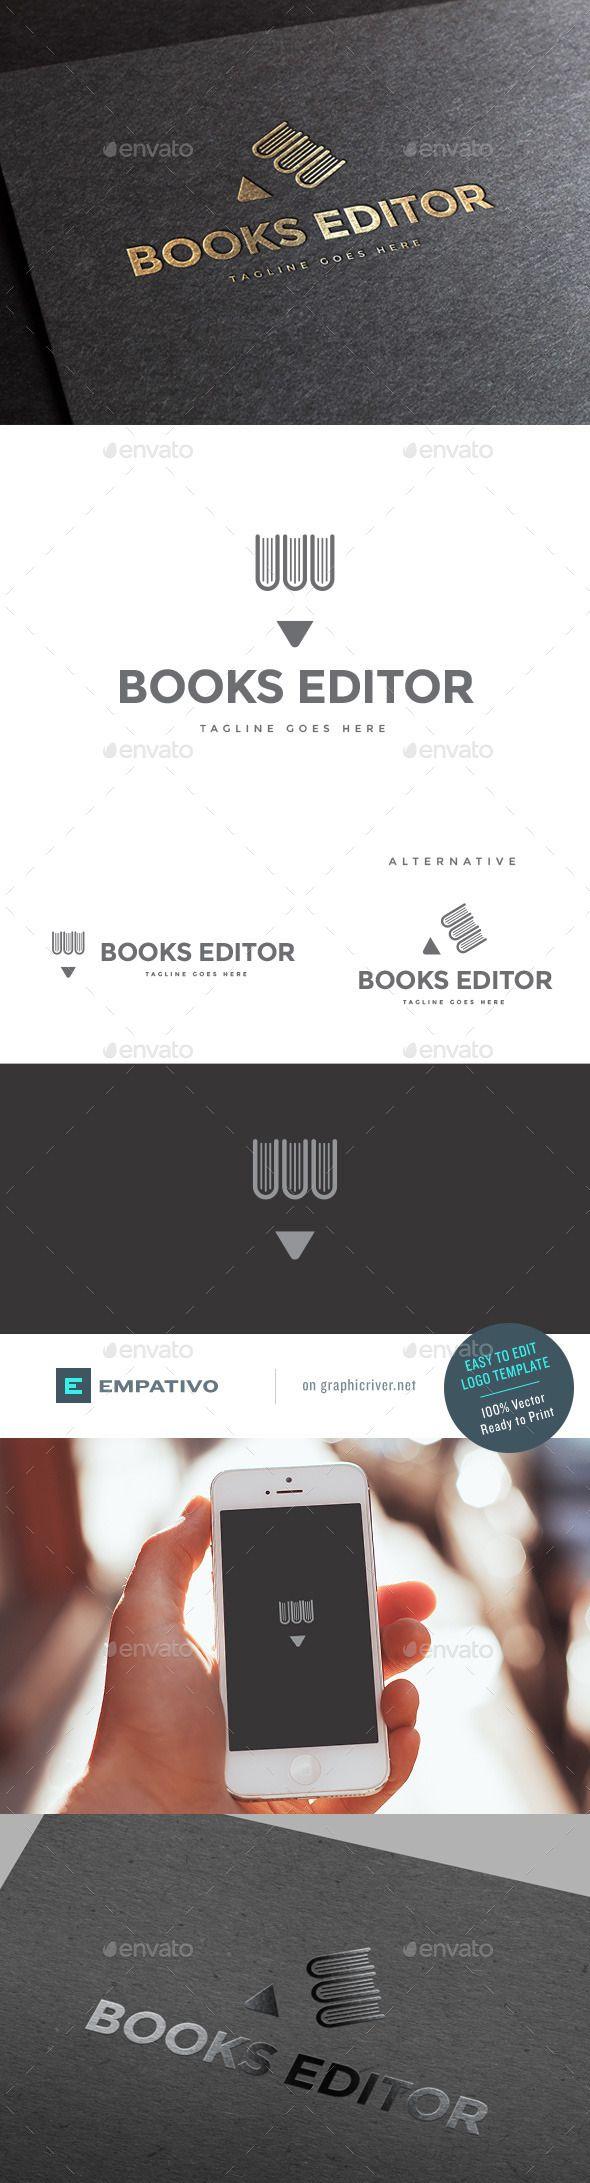 Design A Typographic Logo Publisher